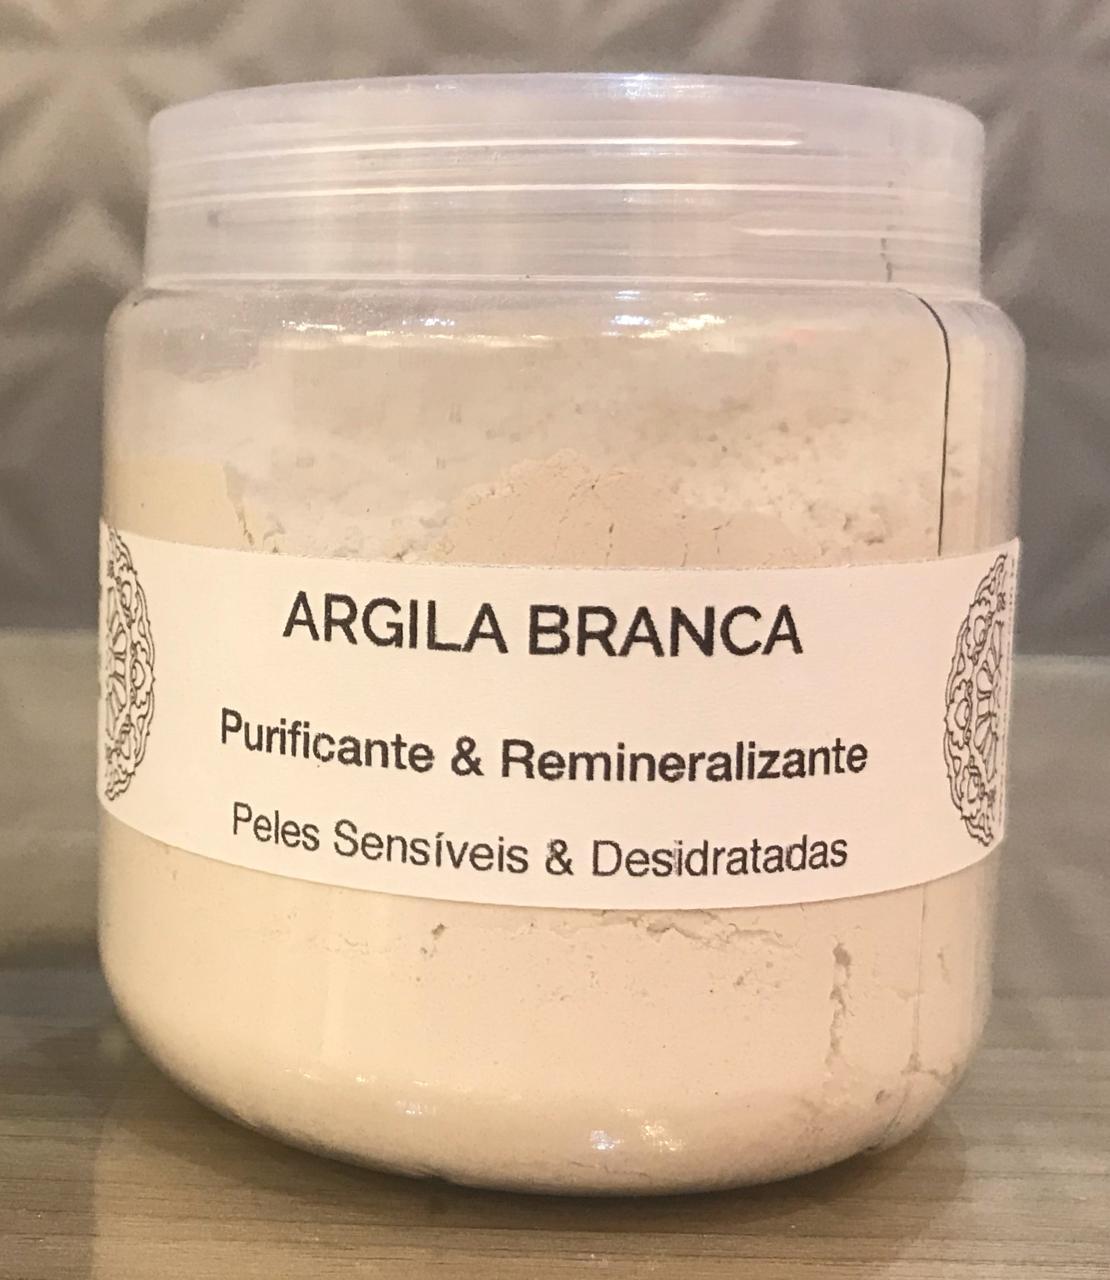 Argila Branca (Pó) - 100% Natural & Vegetal - Chapada Diamantina  - EMPÓRIO CHAPADA DIAMANTINA